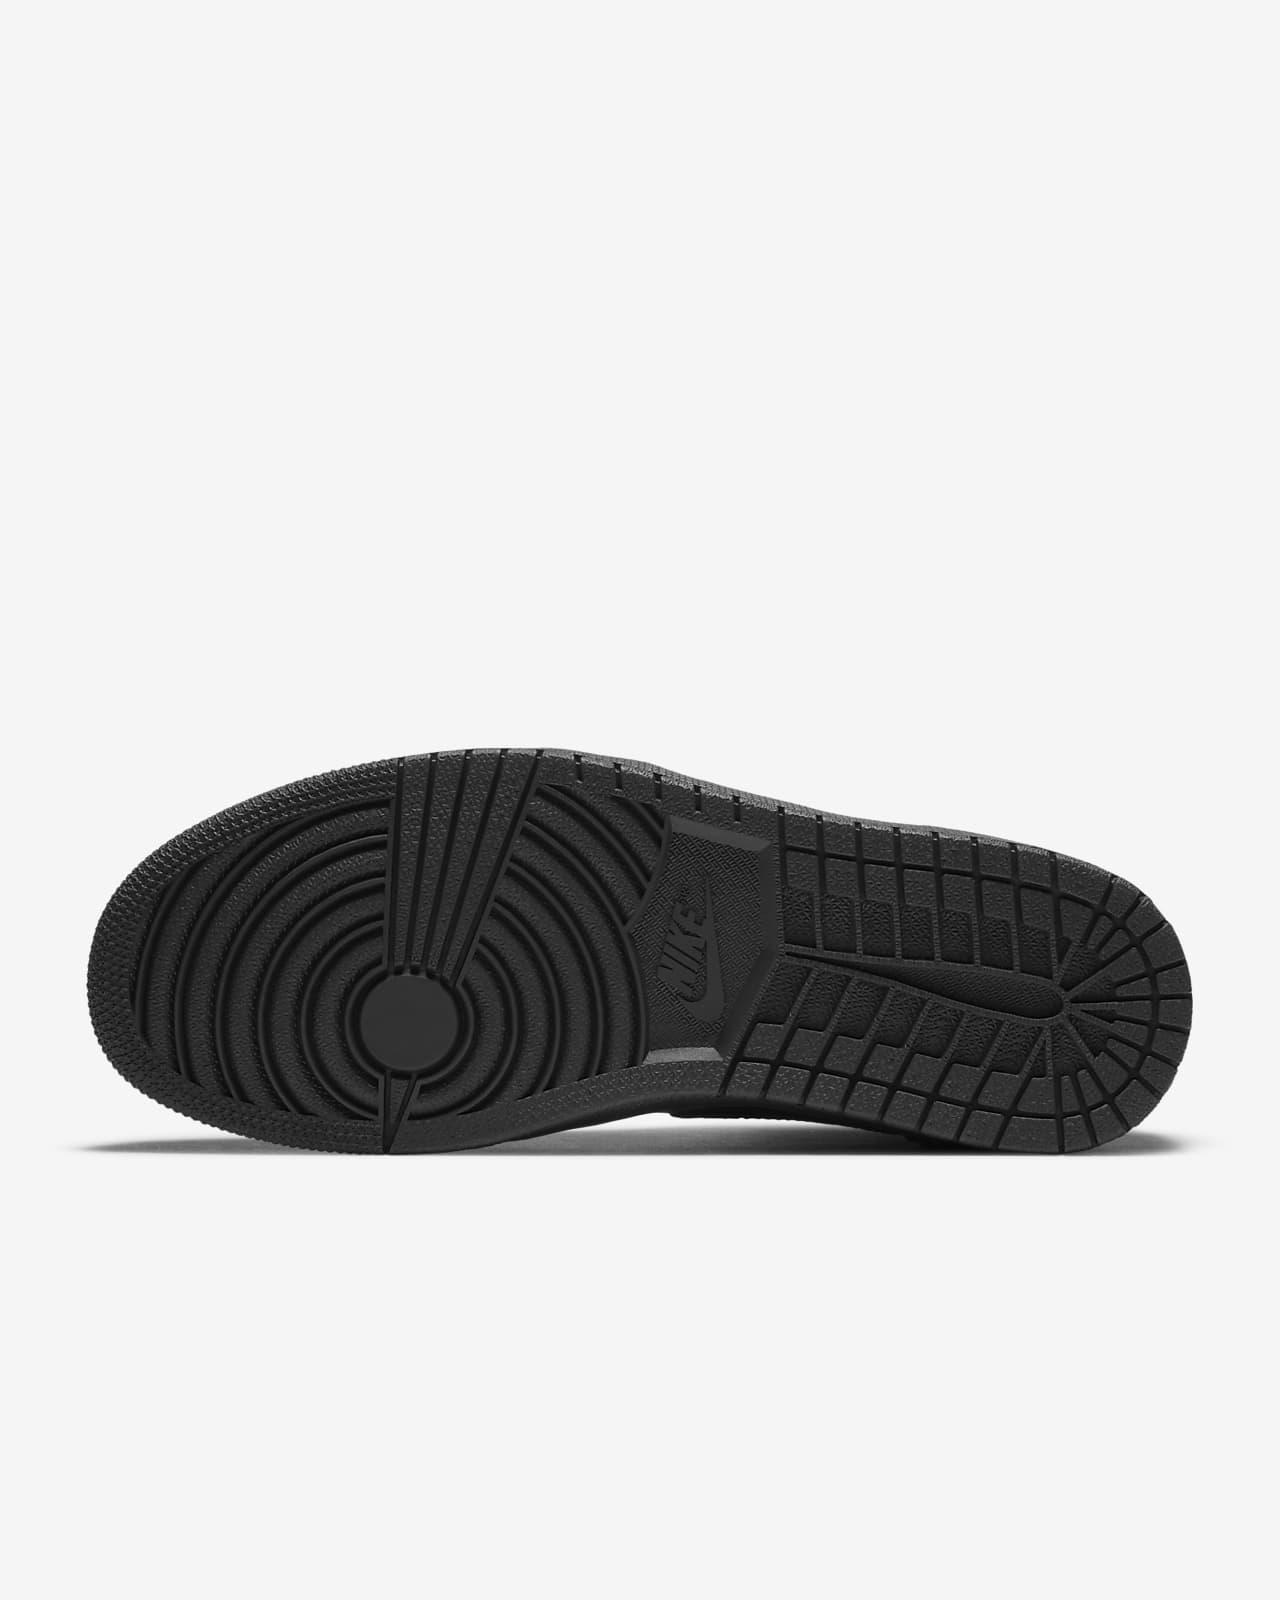 Chaussure Air Jordan 1 Mid. Nike LU